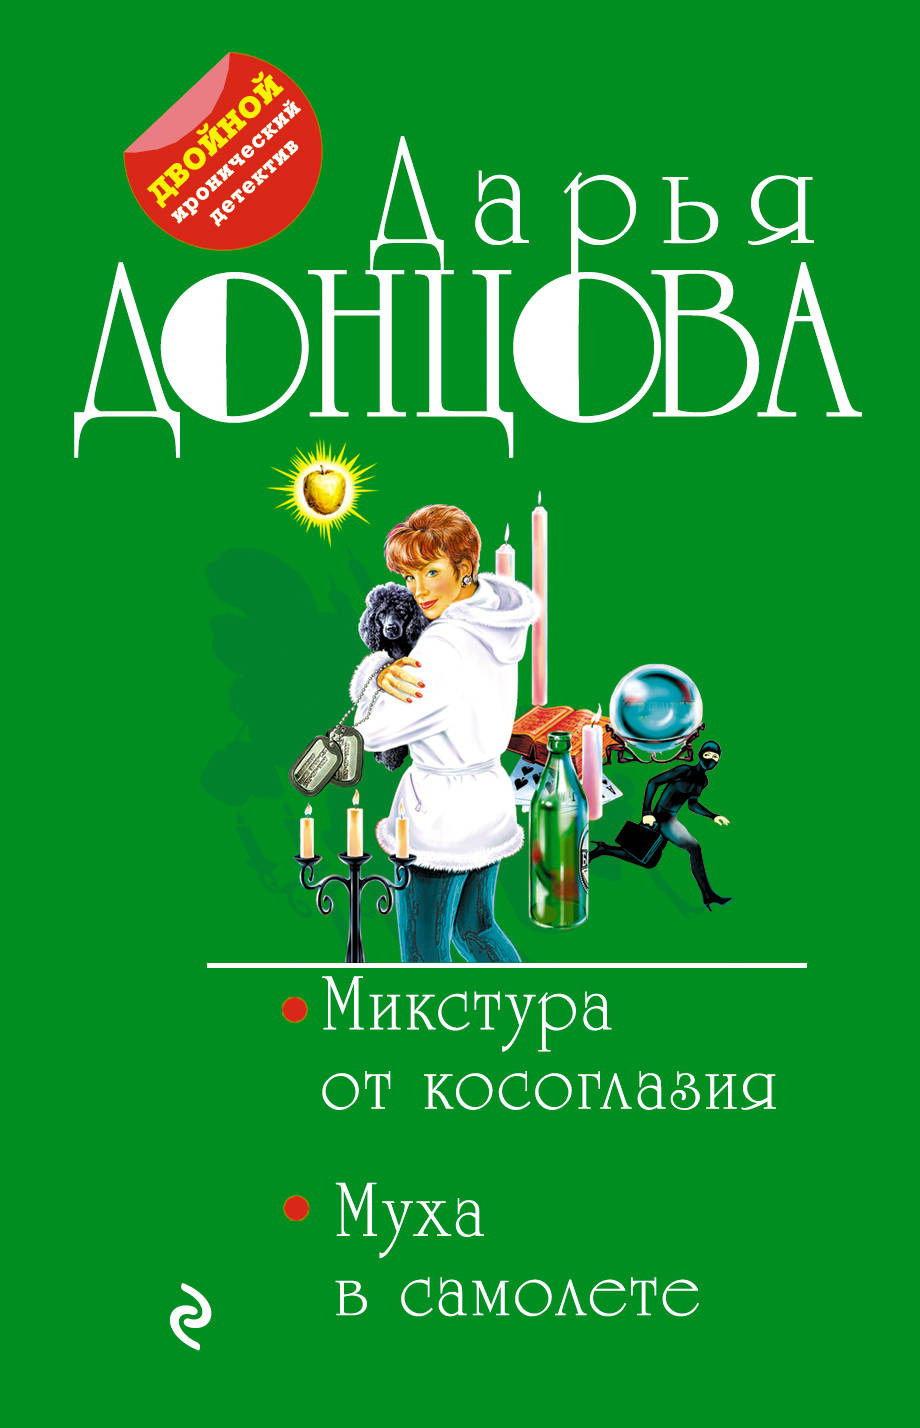 Perdimonokl (Russian Language)